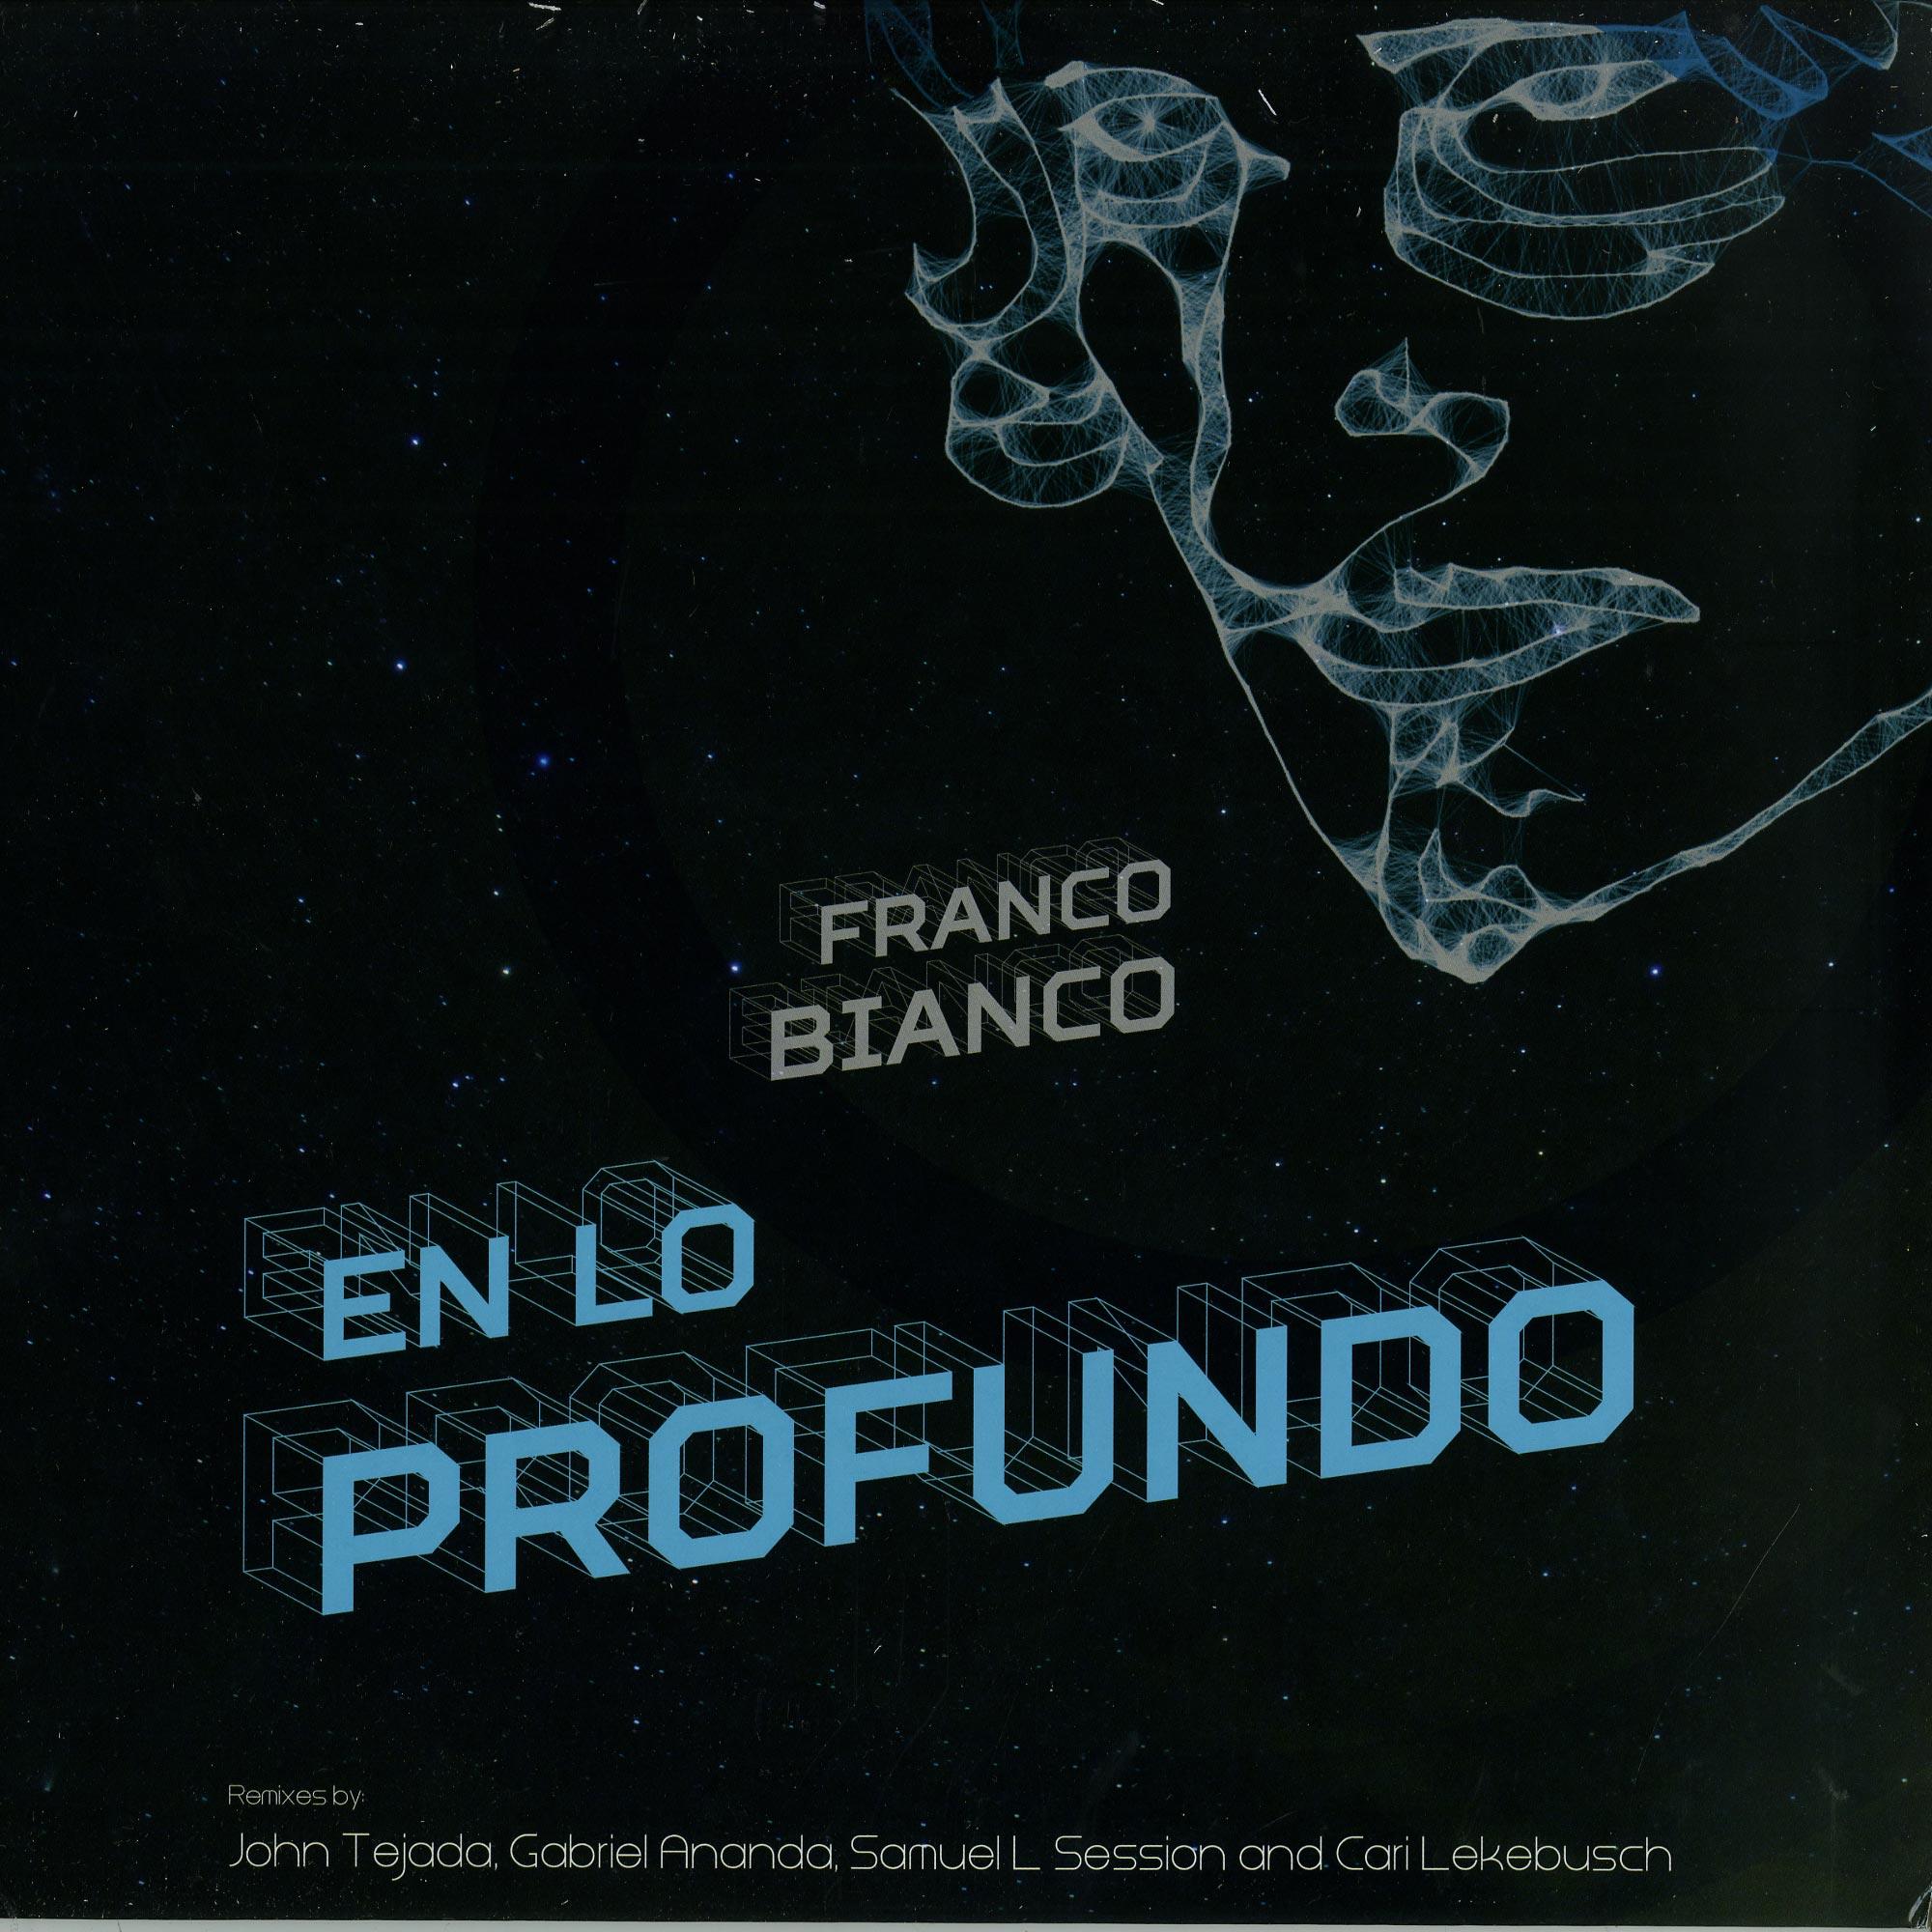 Franco Bianco - EN LO PROFUNDO